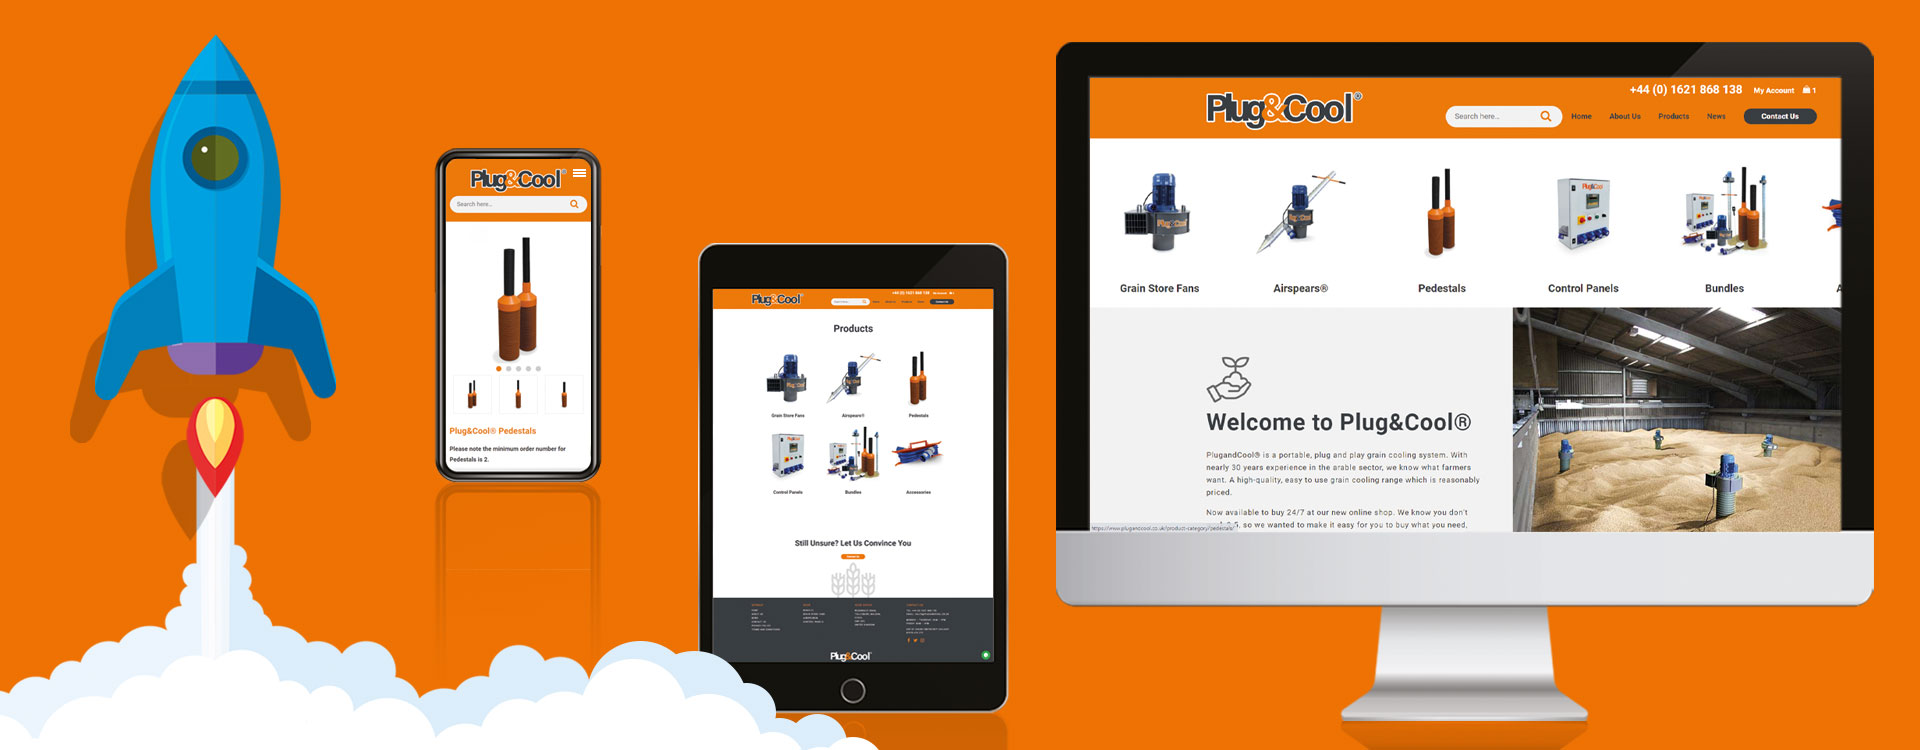 Plug&Cool new website